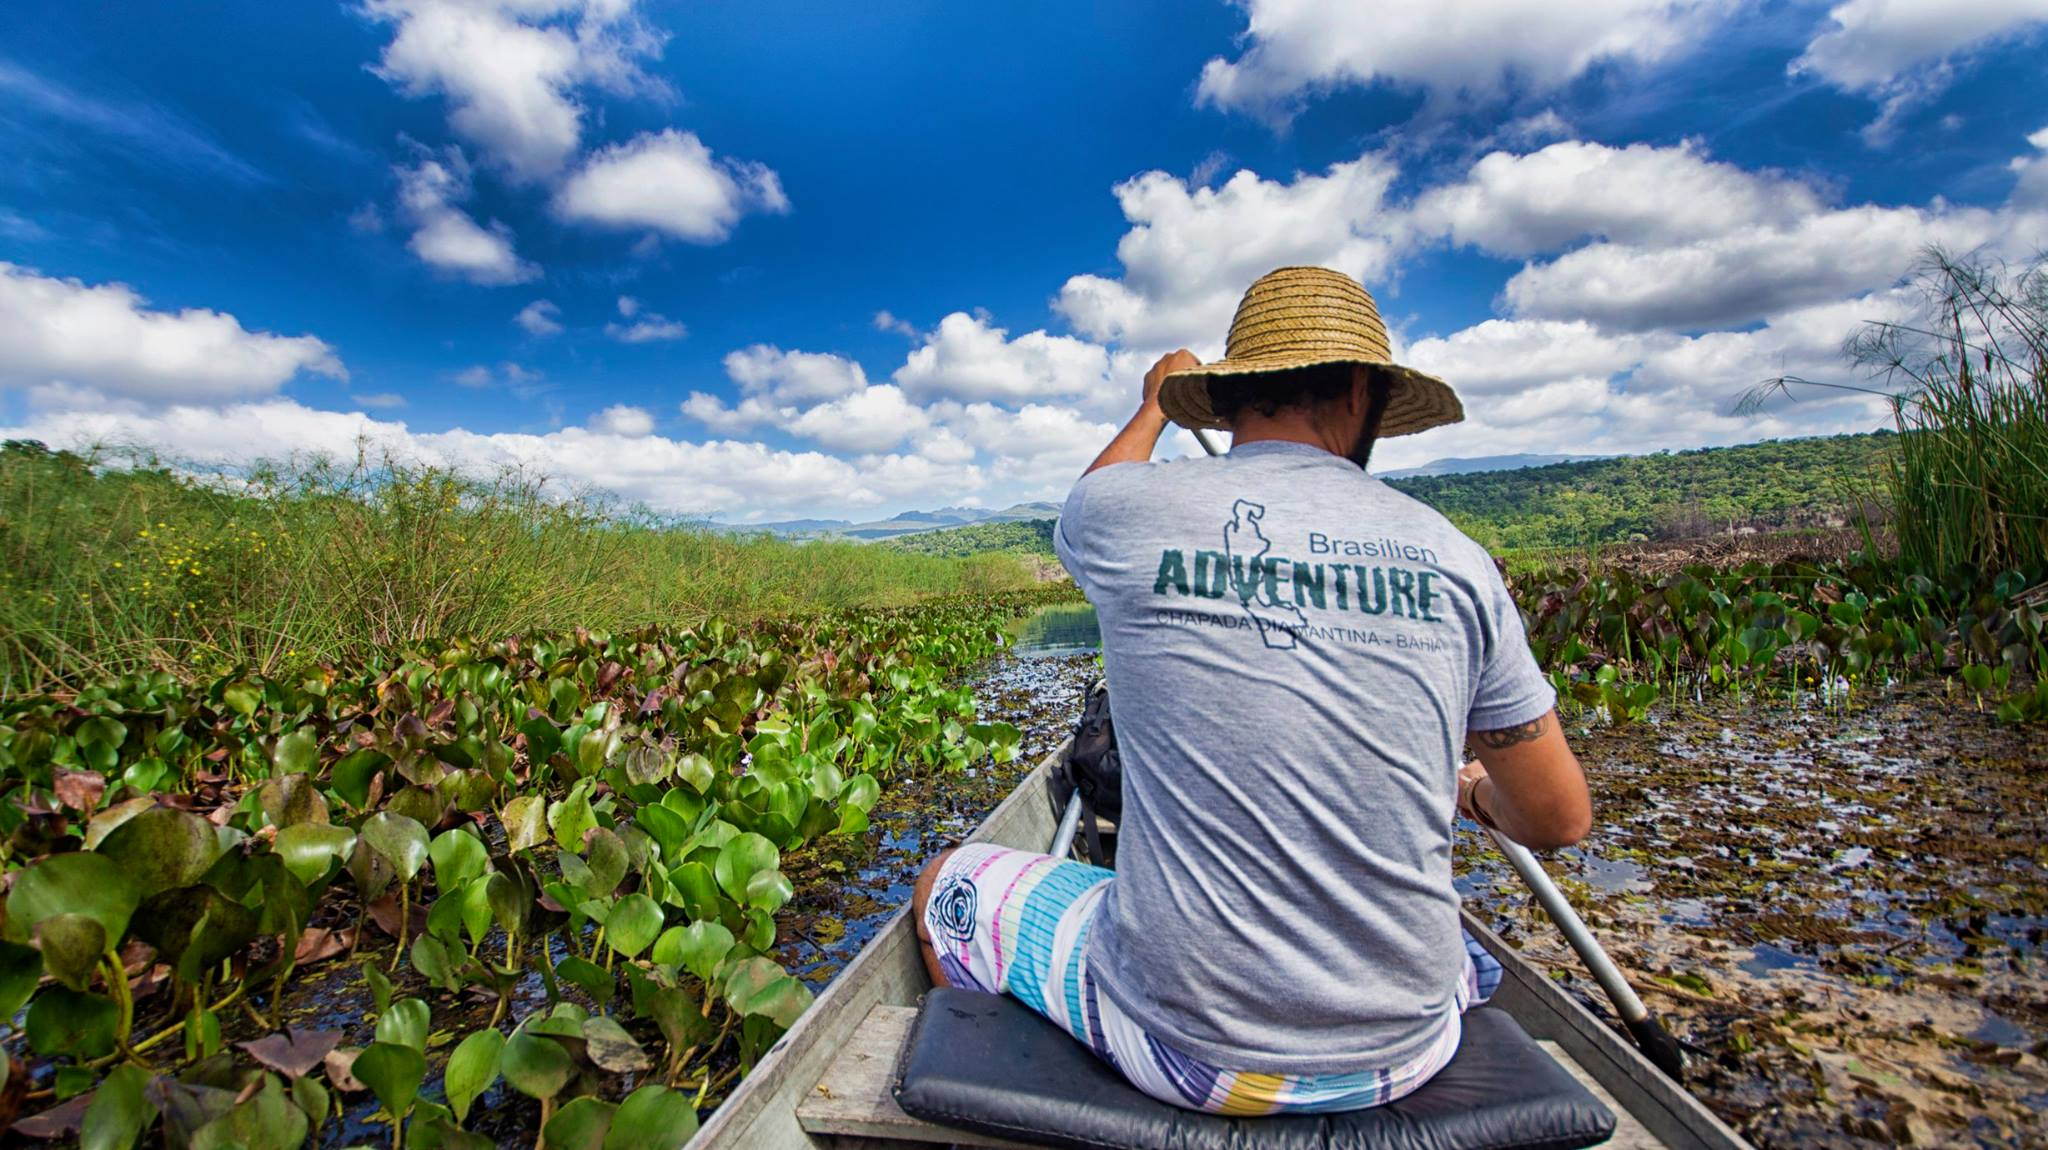 Marimbus Brasilien Adventure